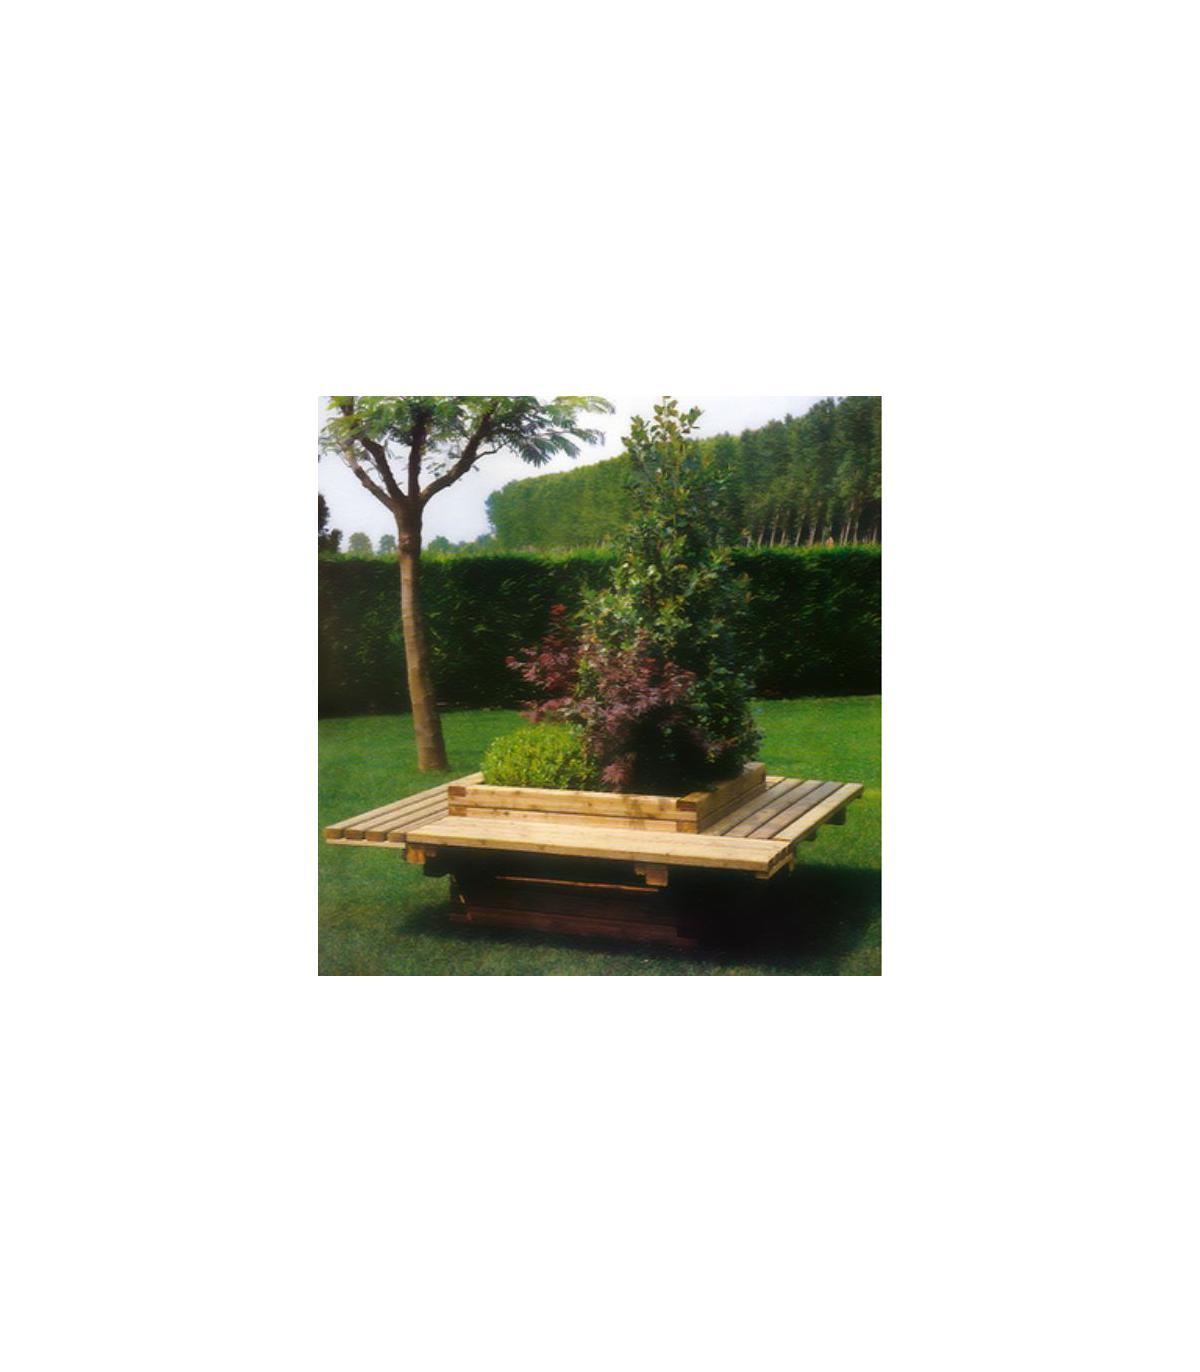 Mj010 Jardinière - Banc (Md) concernant Loveuse Jardin